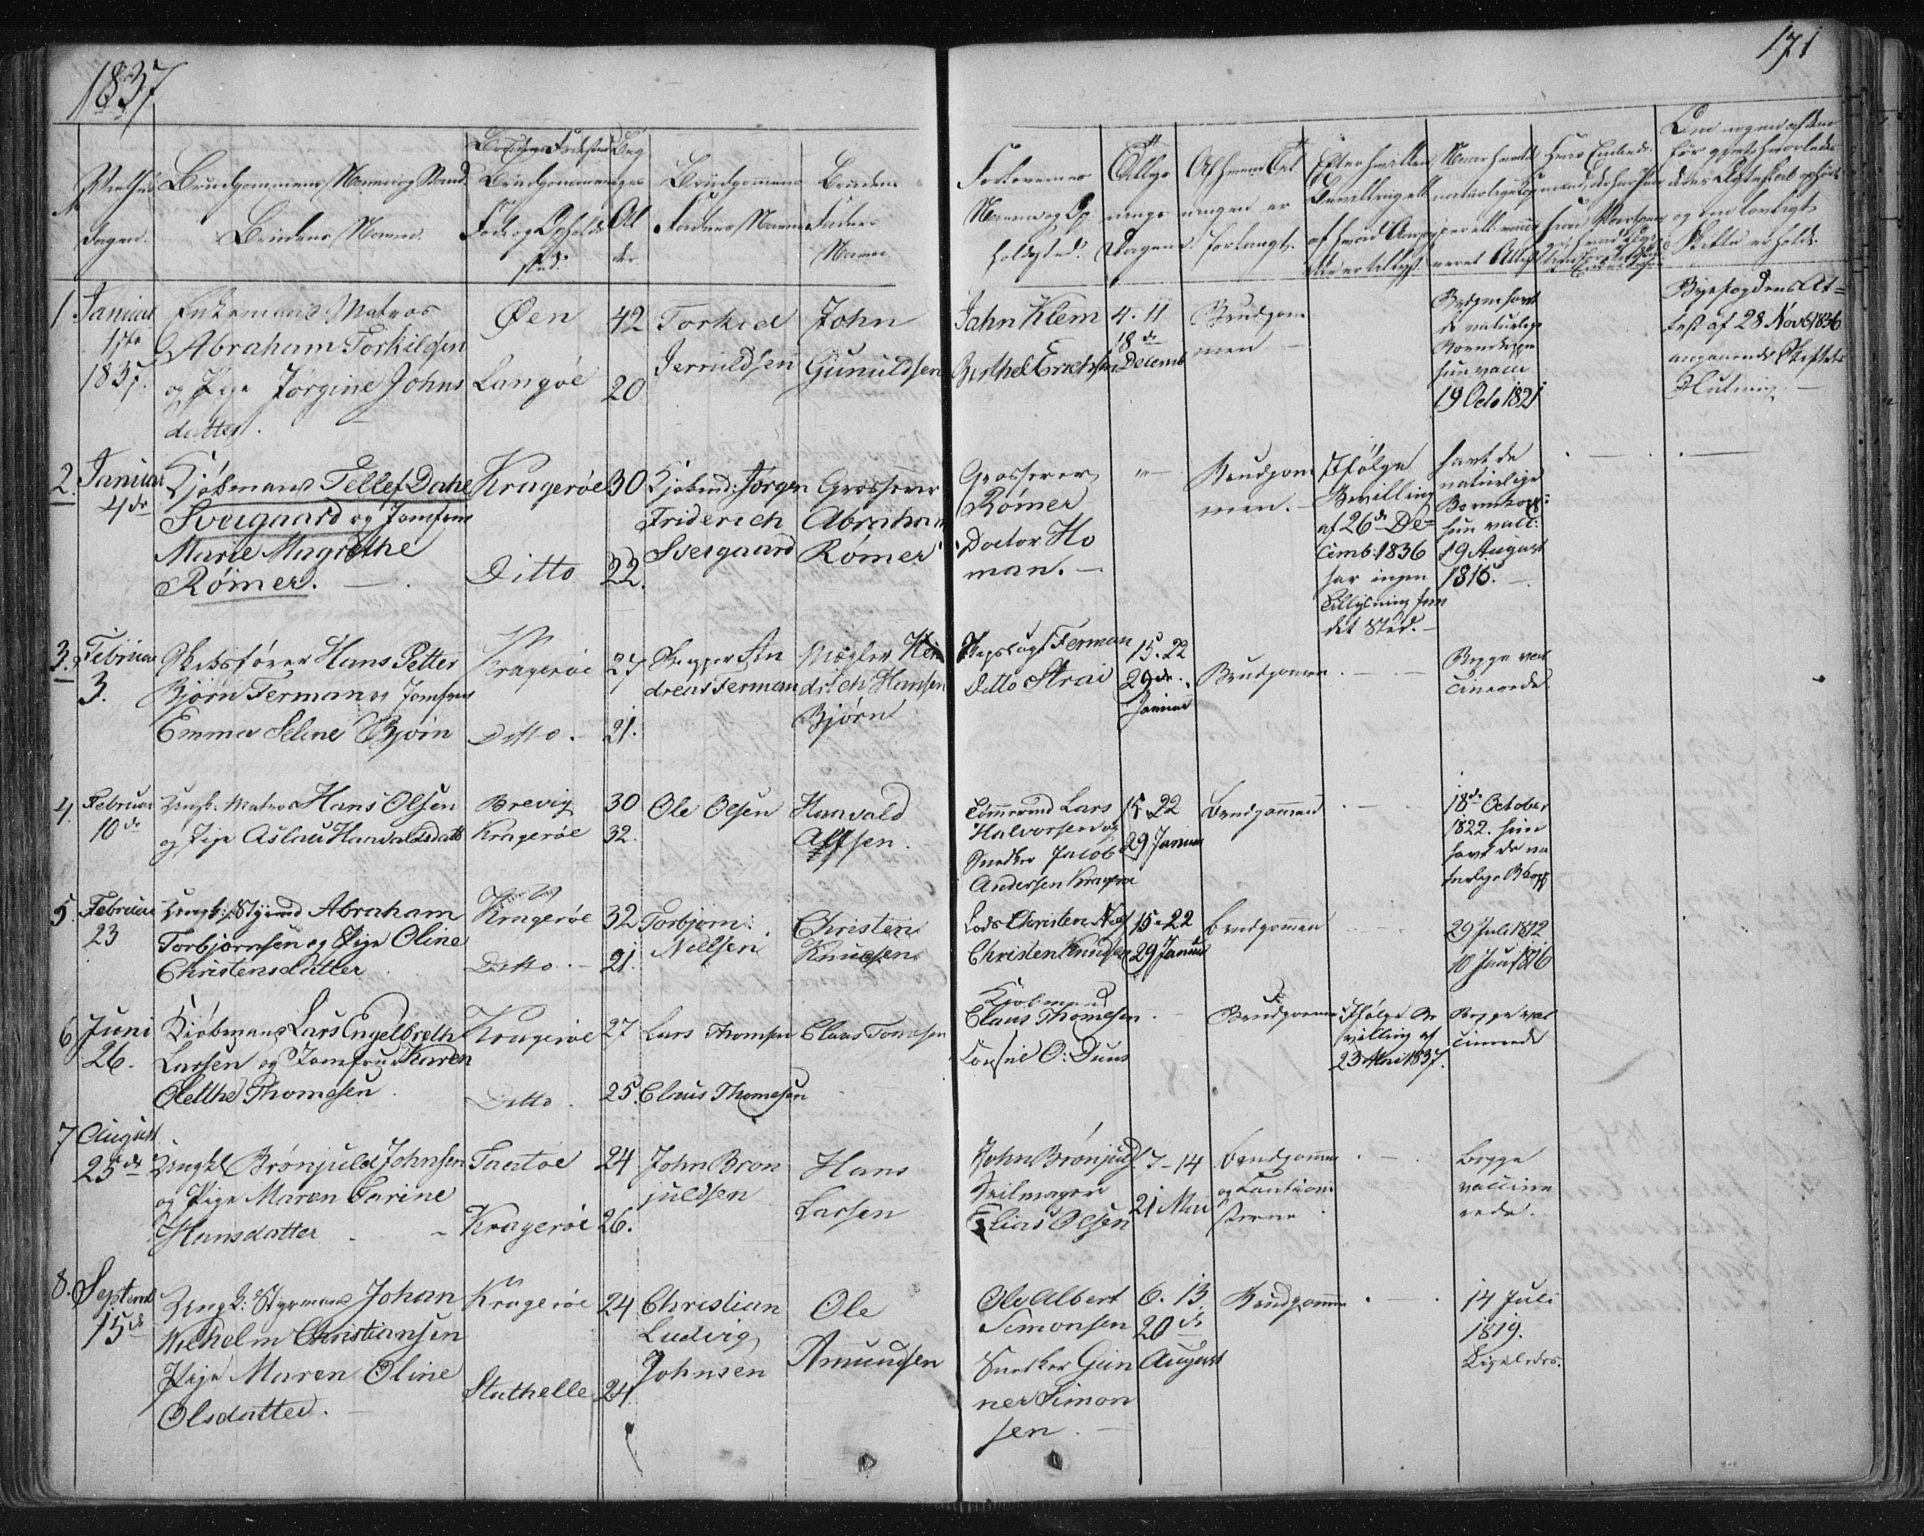 SAKO, Kragerø kirkebøker, F/Fa/L0005: Ministerialbok nr. 5, 1832-1847, s. 171